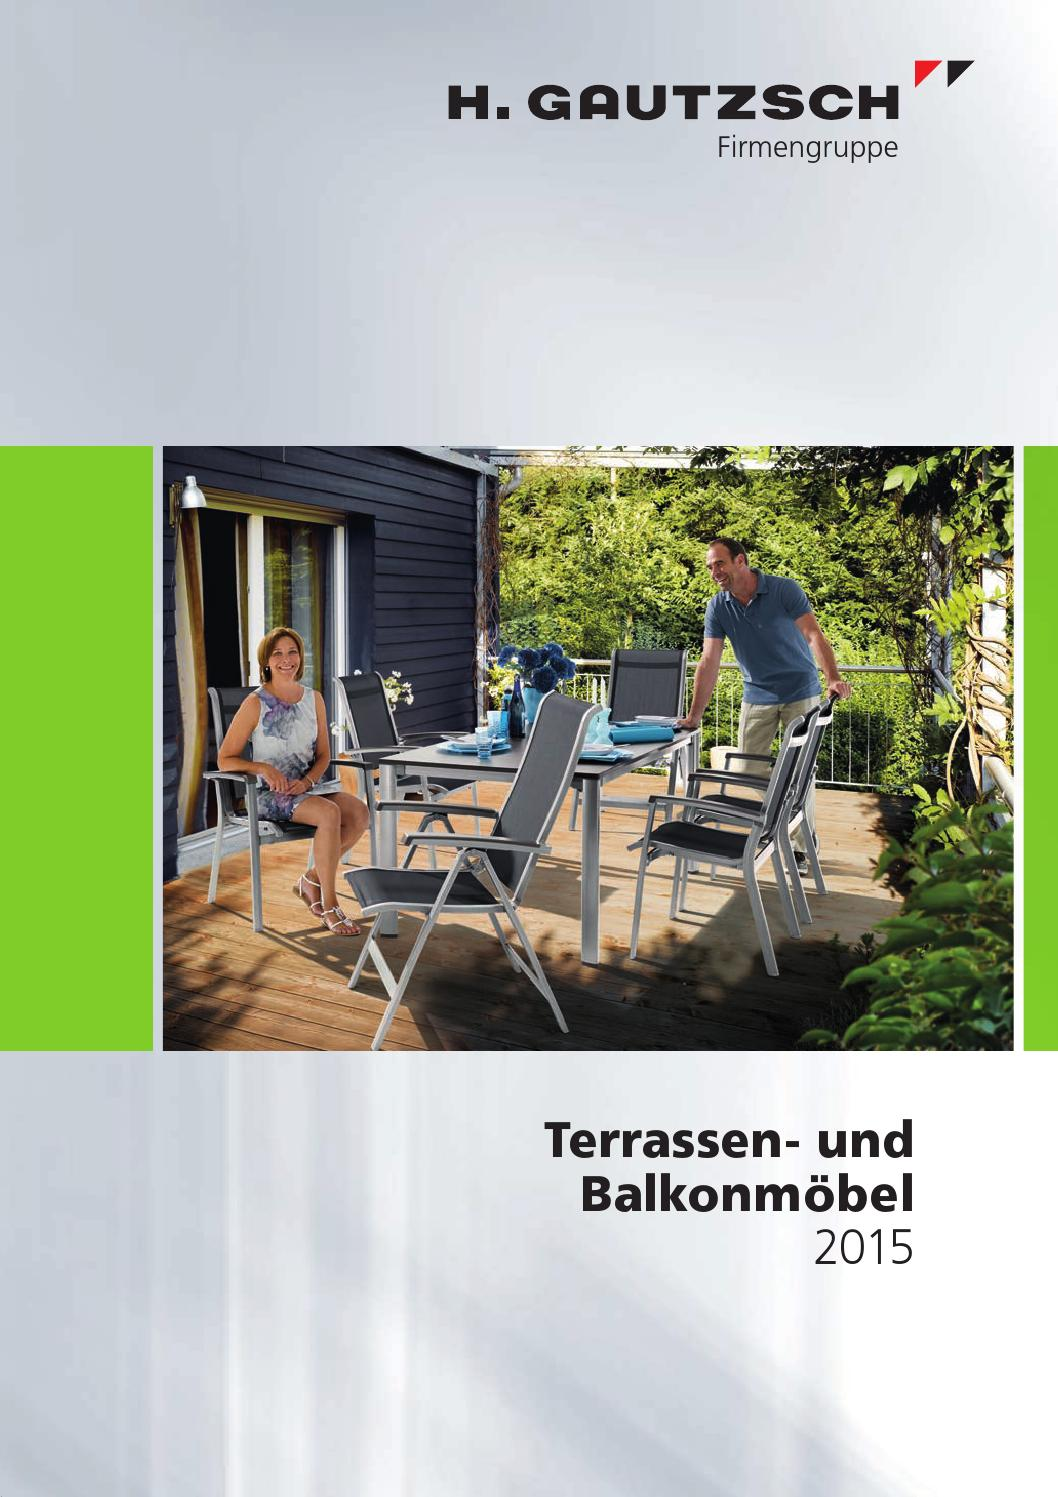 gautzsch gartenm bel by kaiser design issuu. Black Bedroom Furniture Sets. Home Design Ideas